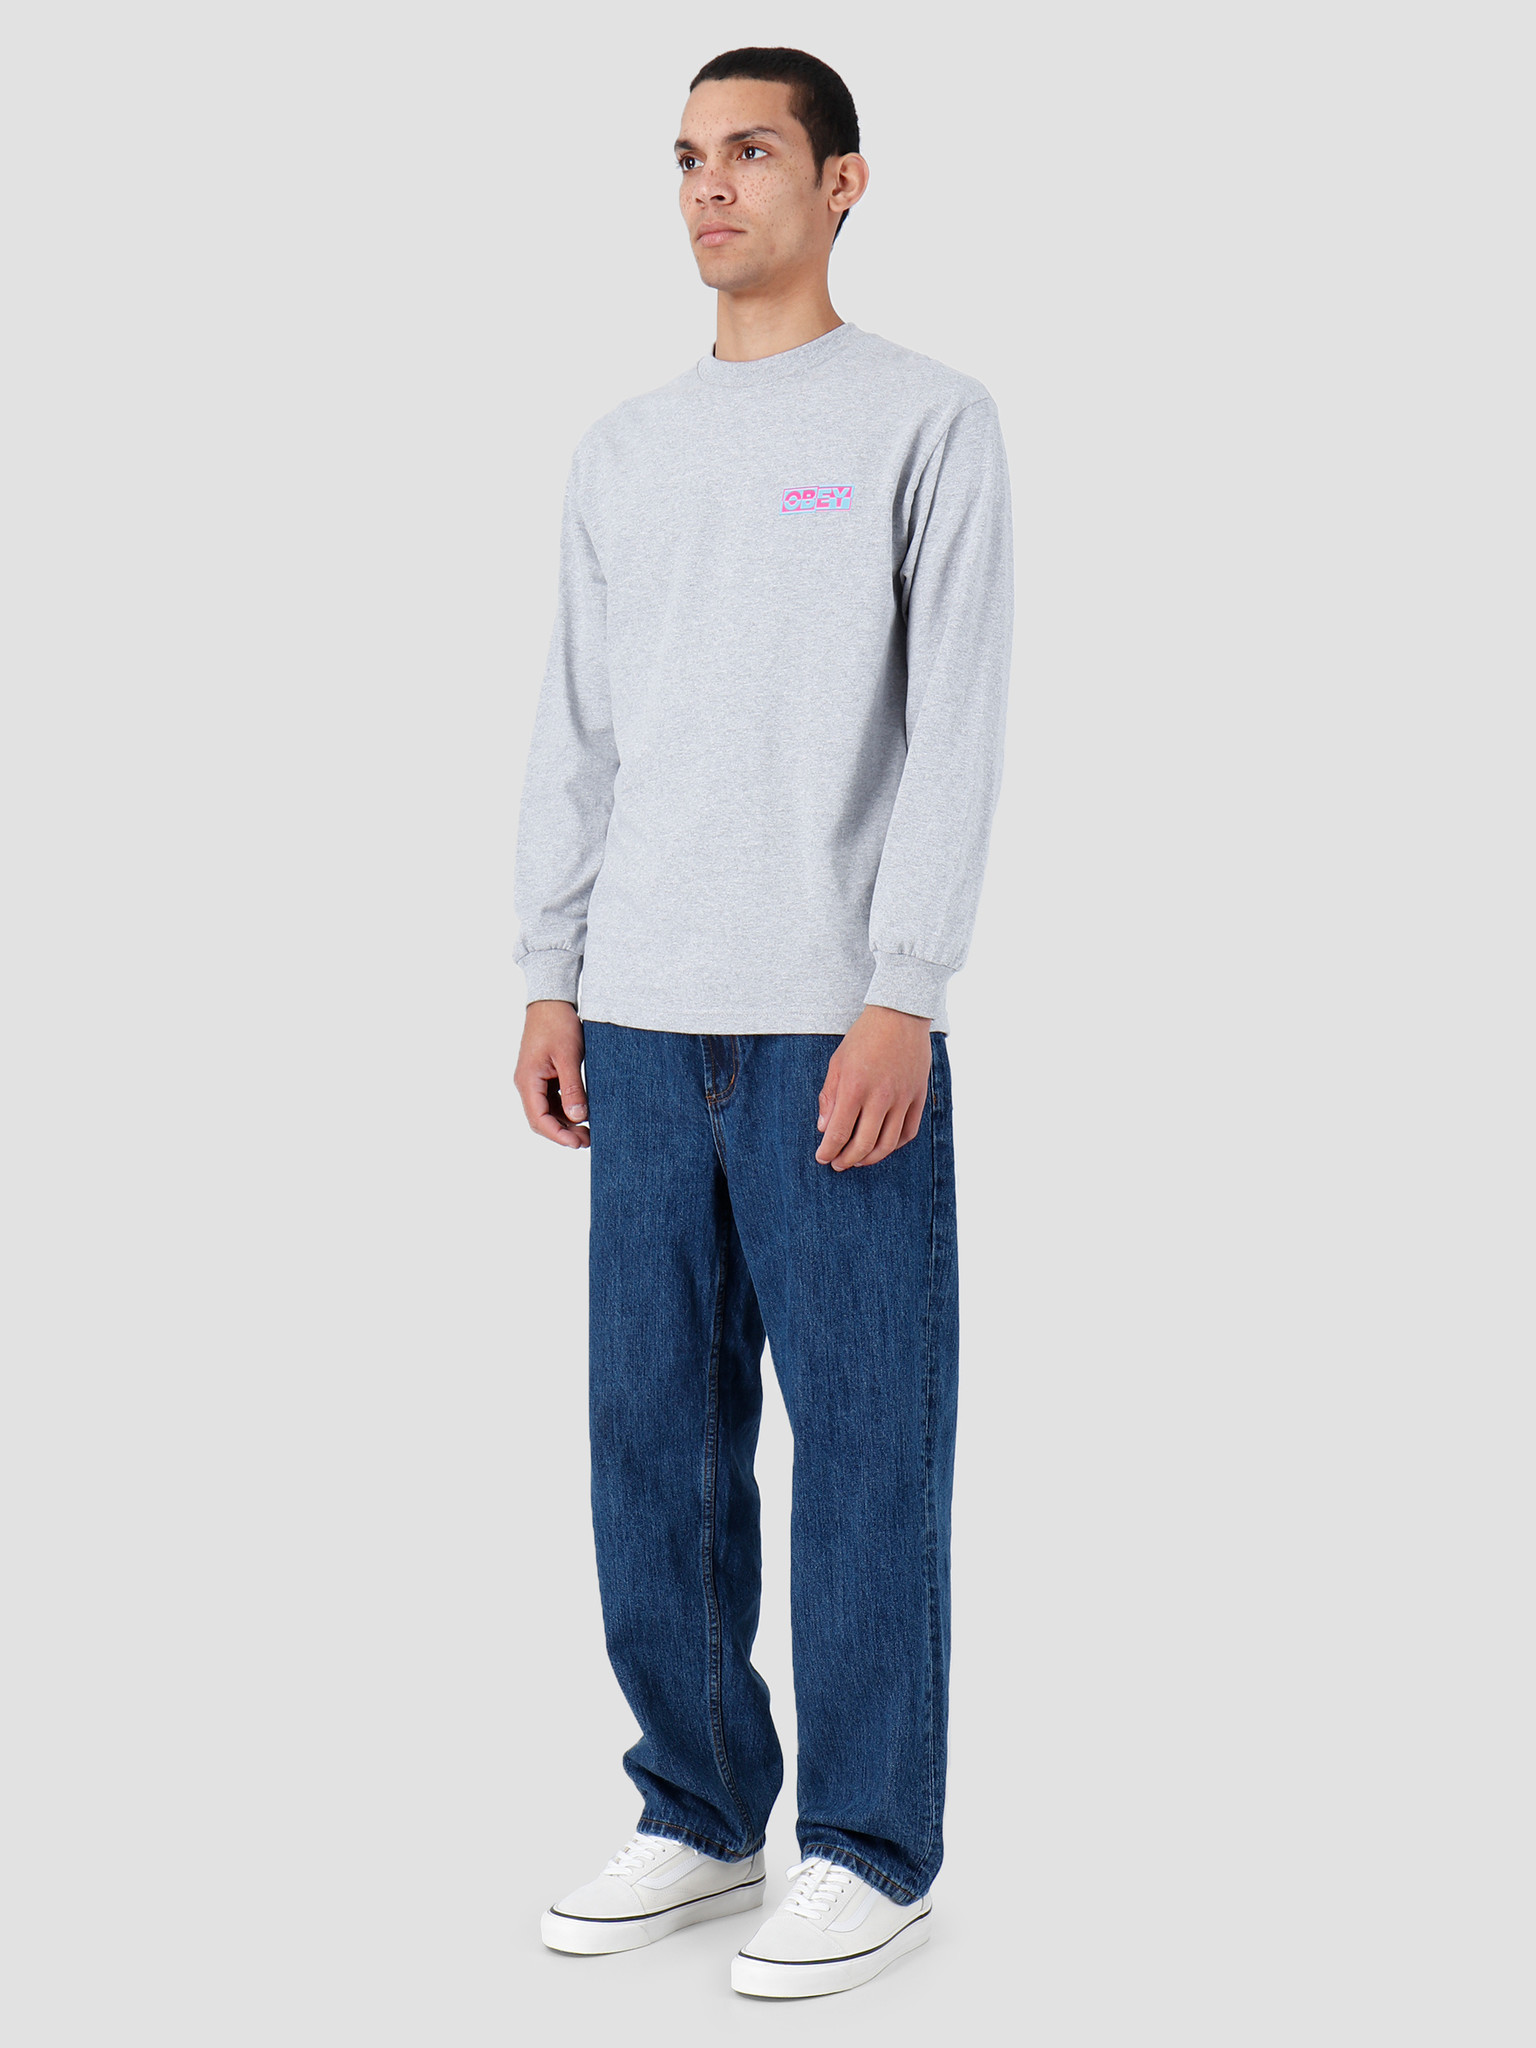 Obey Obey Basic Longsleeve Shirt Heather Grey 164901966-HEA